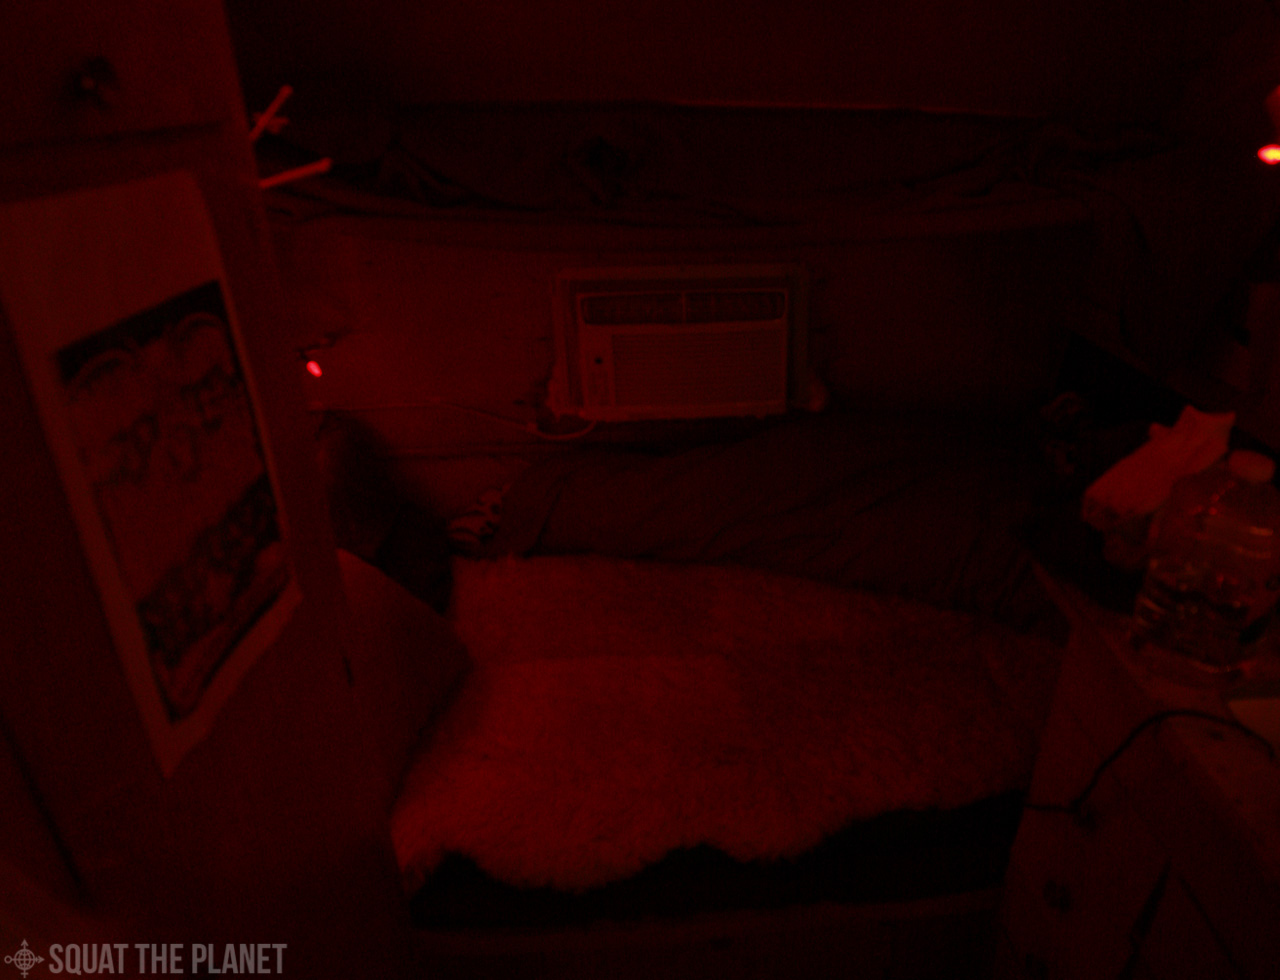 Bear Rug Bed_01-05-2012_001.jpg